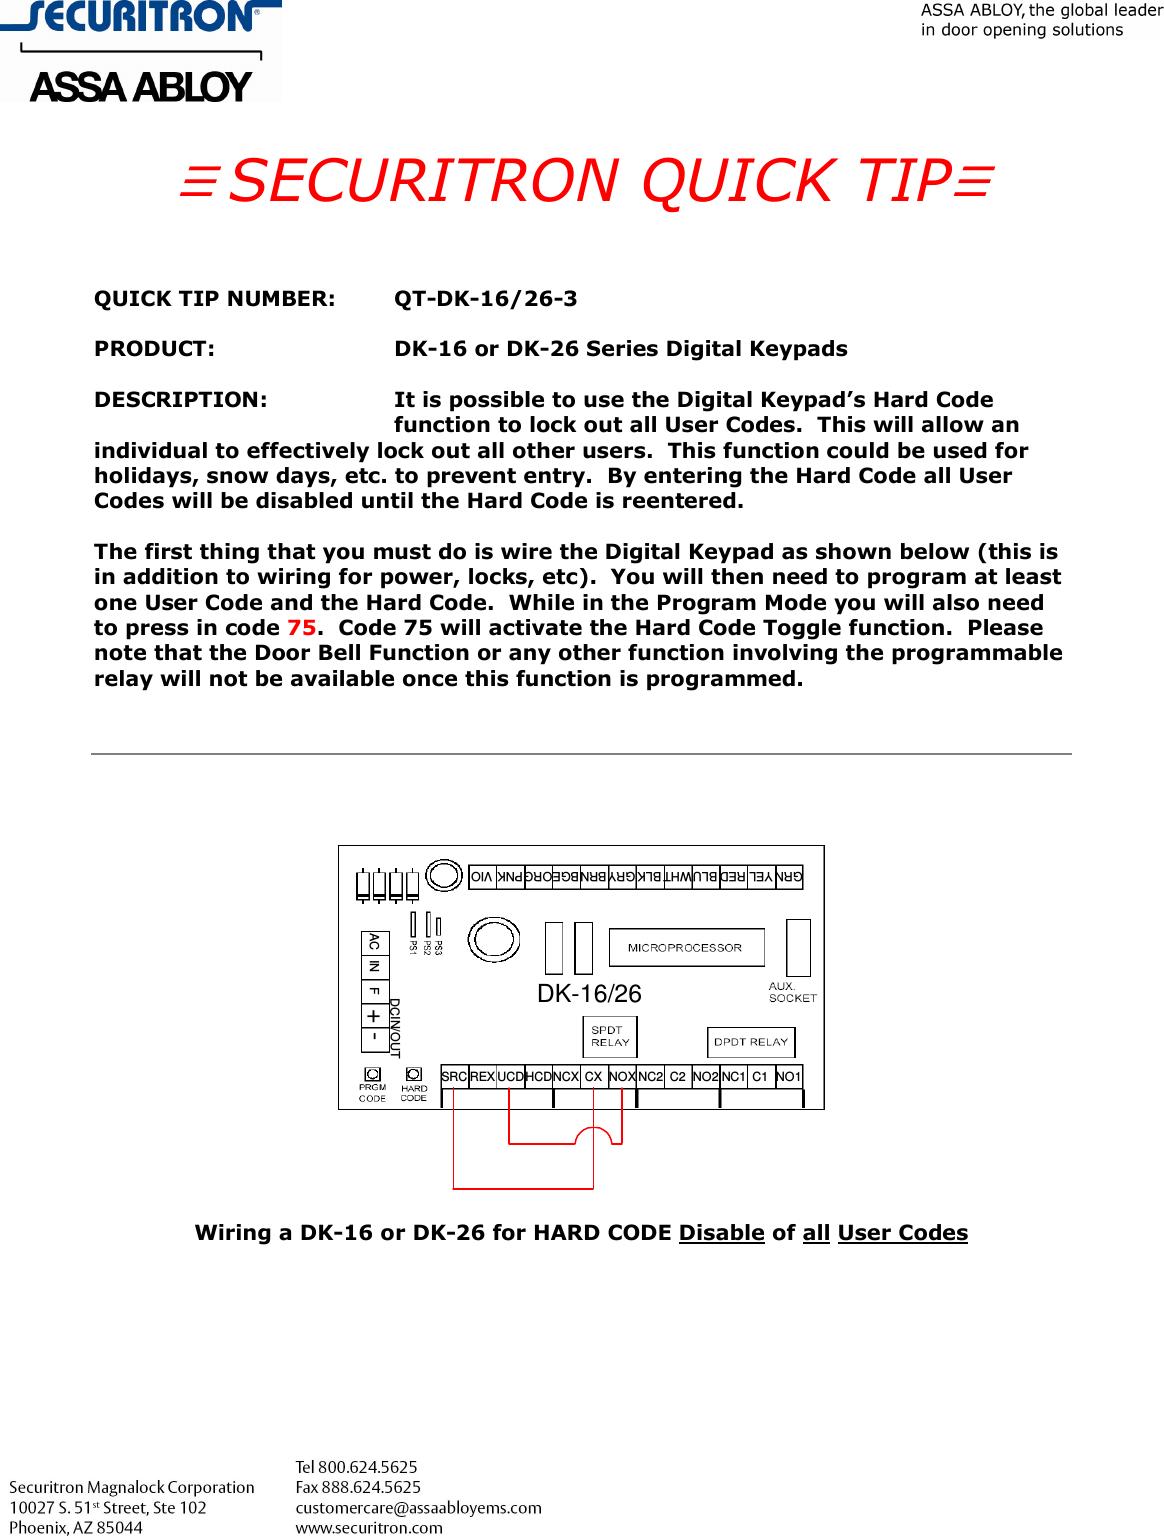 Securitron Qt Dk 16 26 3 Hard Code Diable Of User Codes Disable 137 Dpdt Relay Function K B Disableof